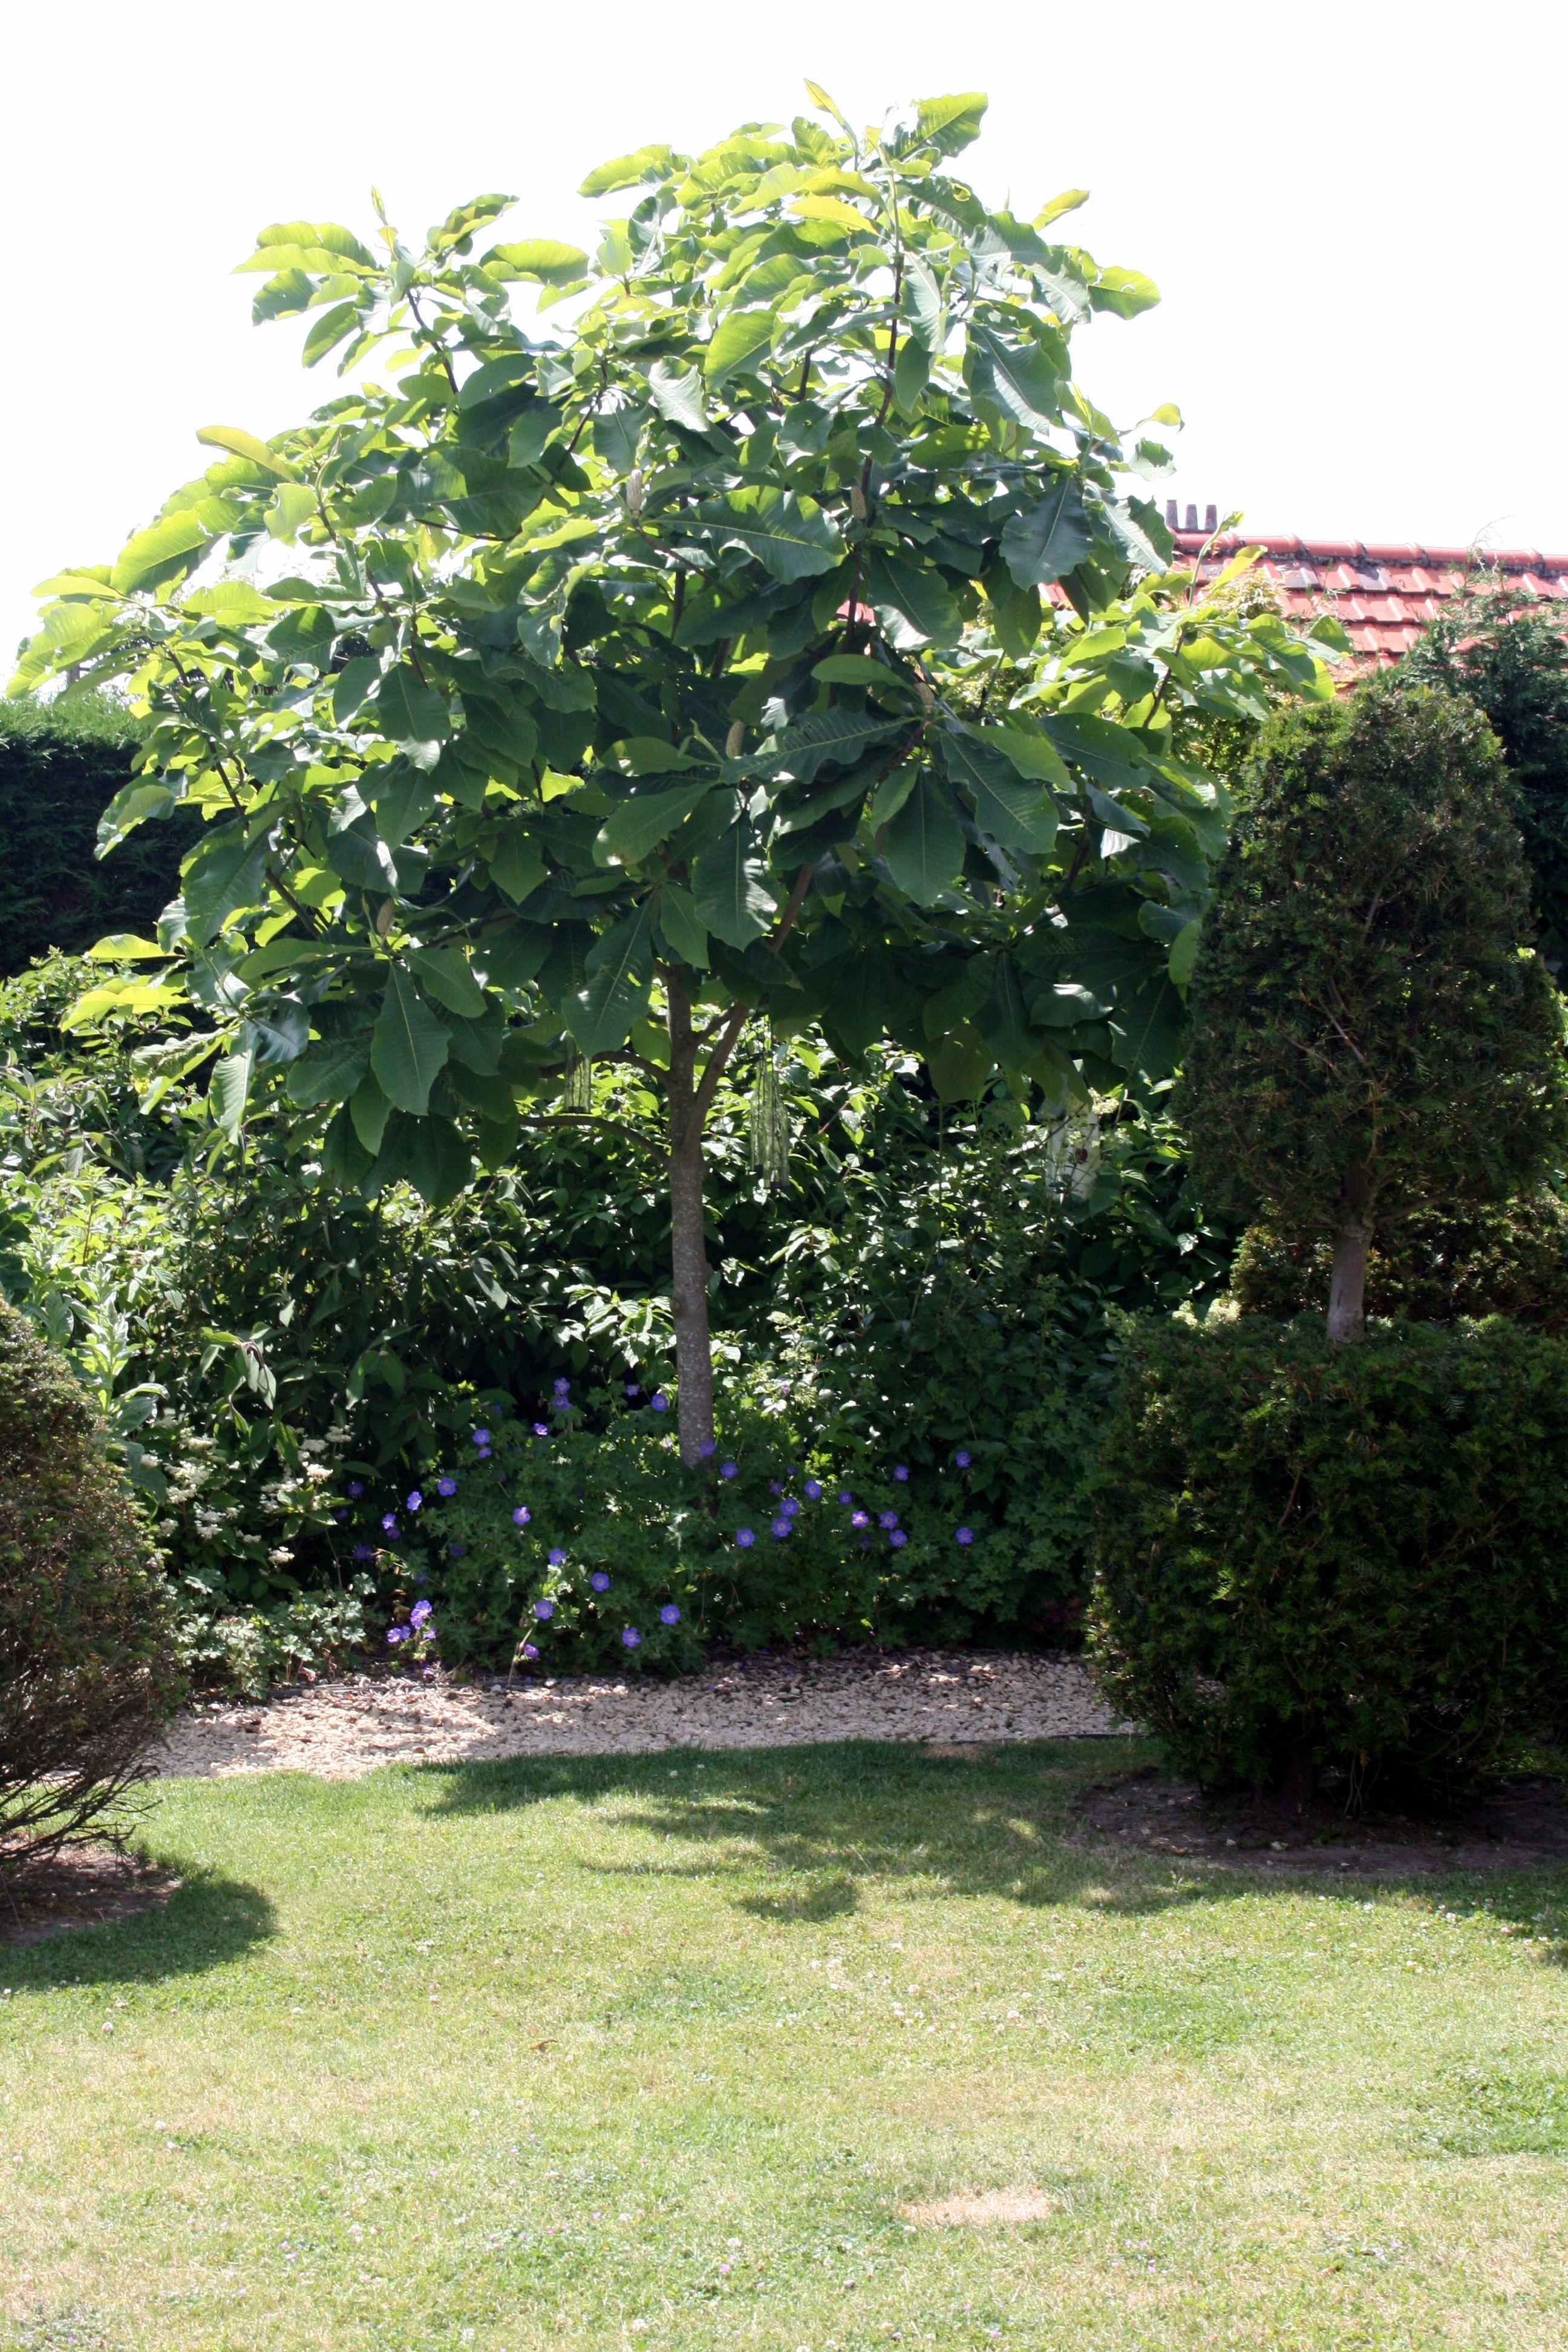 Feigenbaum / Gartenreise Belgien / Holland | Pflanzen | Pinterest ... Bonsai Baum Dekoidee Indoor Garten